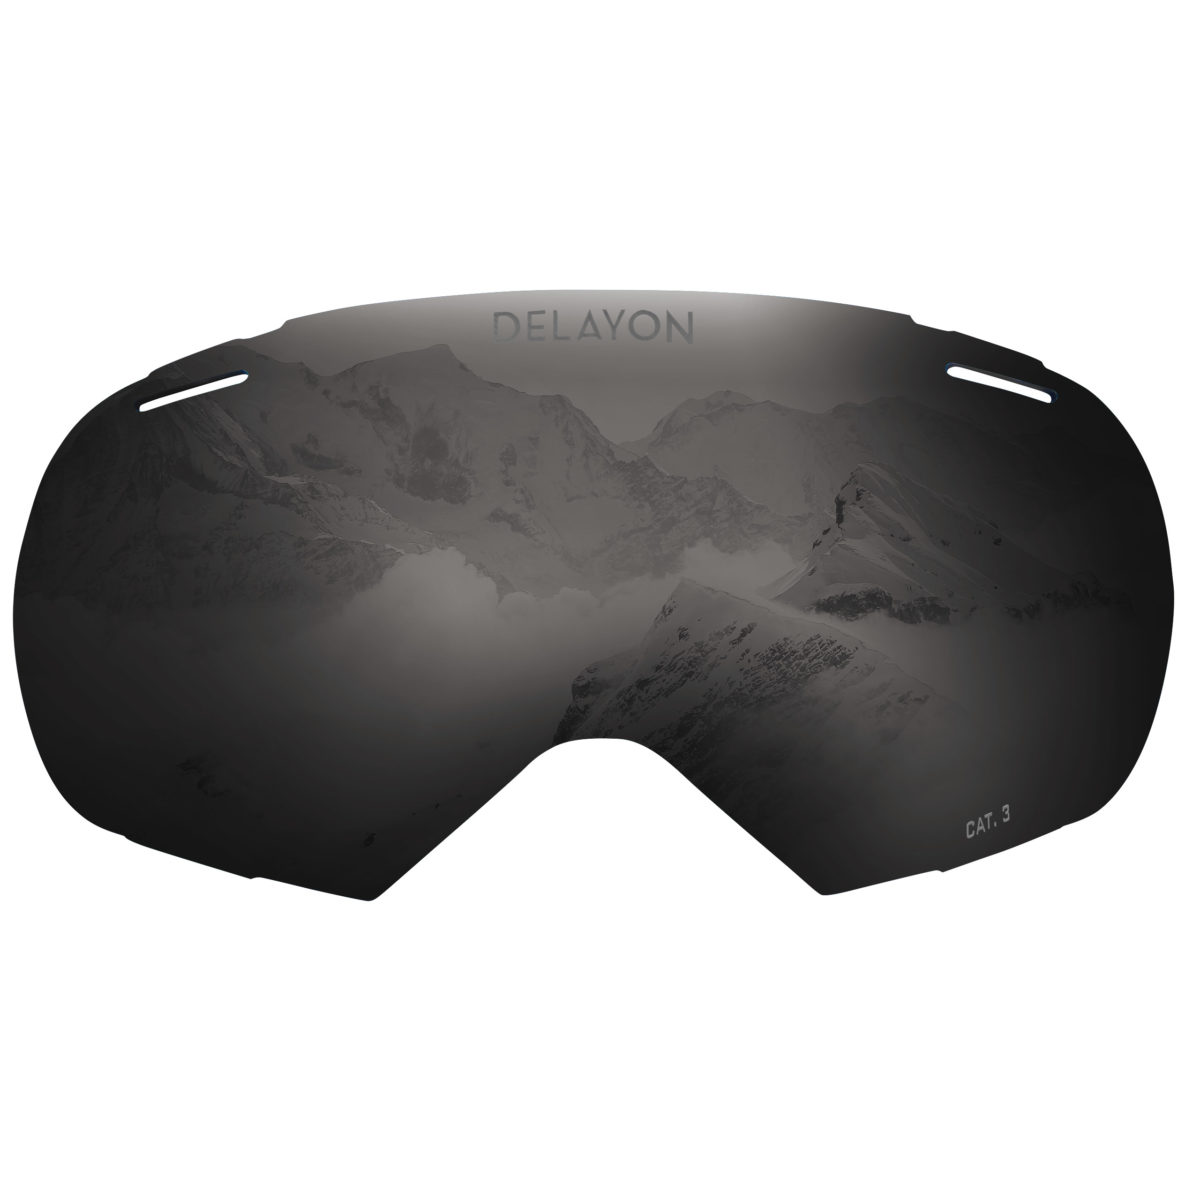 DELAYON Eyewear Puzzle Goggle STRONG Black Lens